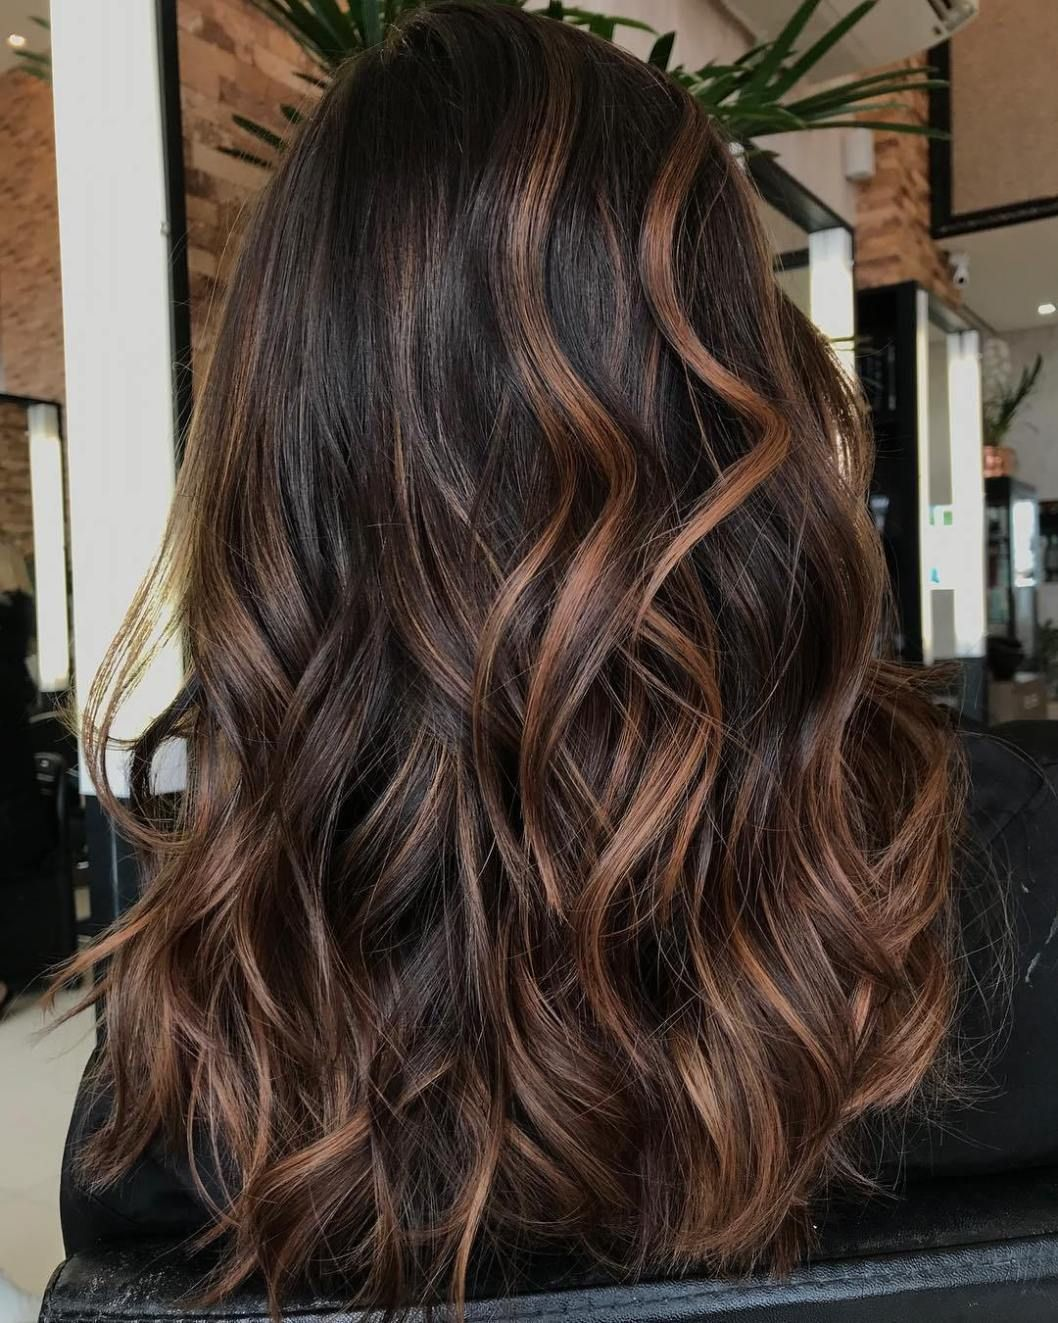 20 Impressive Haircuts And Hairstyles For Long Dark Brown Hair Hair Highlights Hair Styles Brown Hair With Highlights